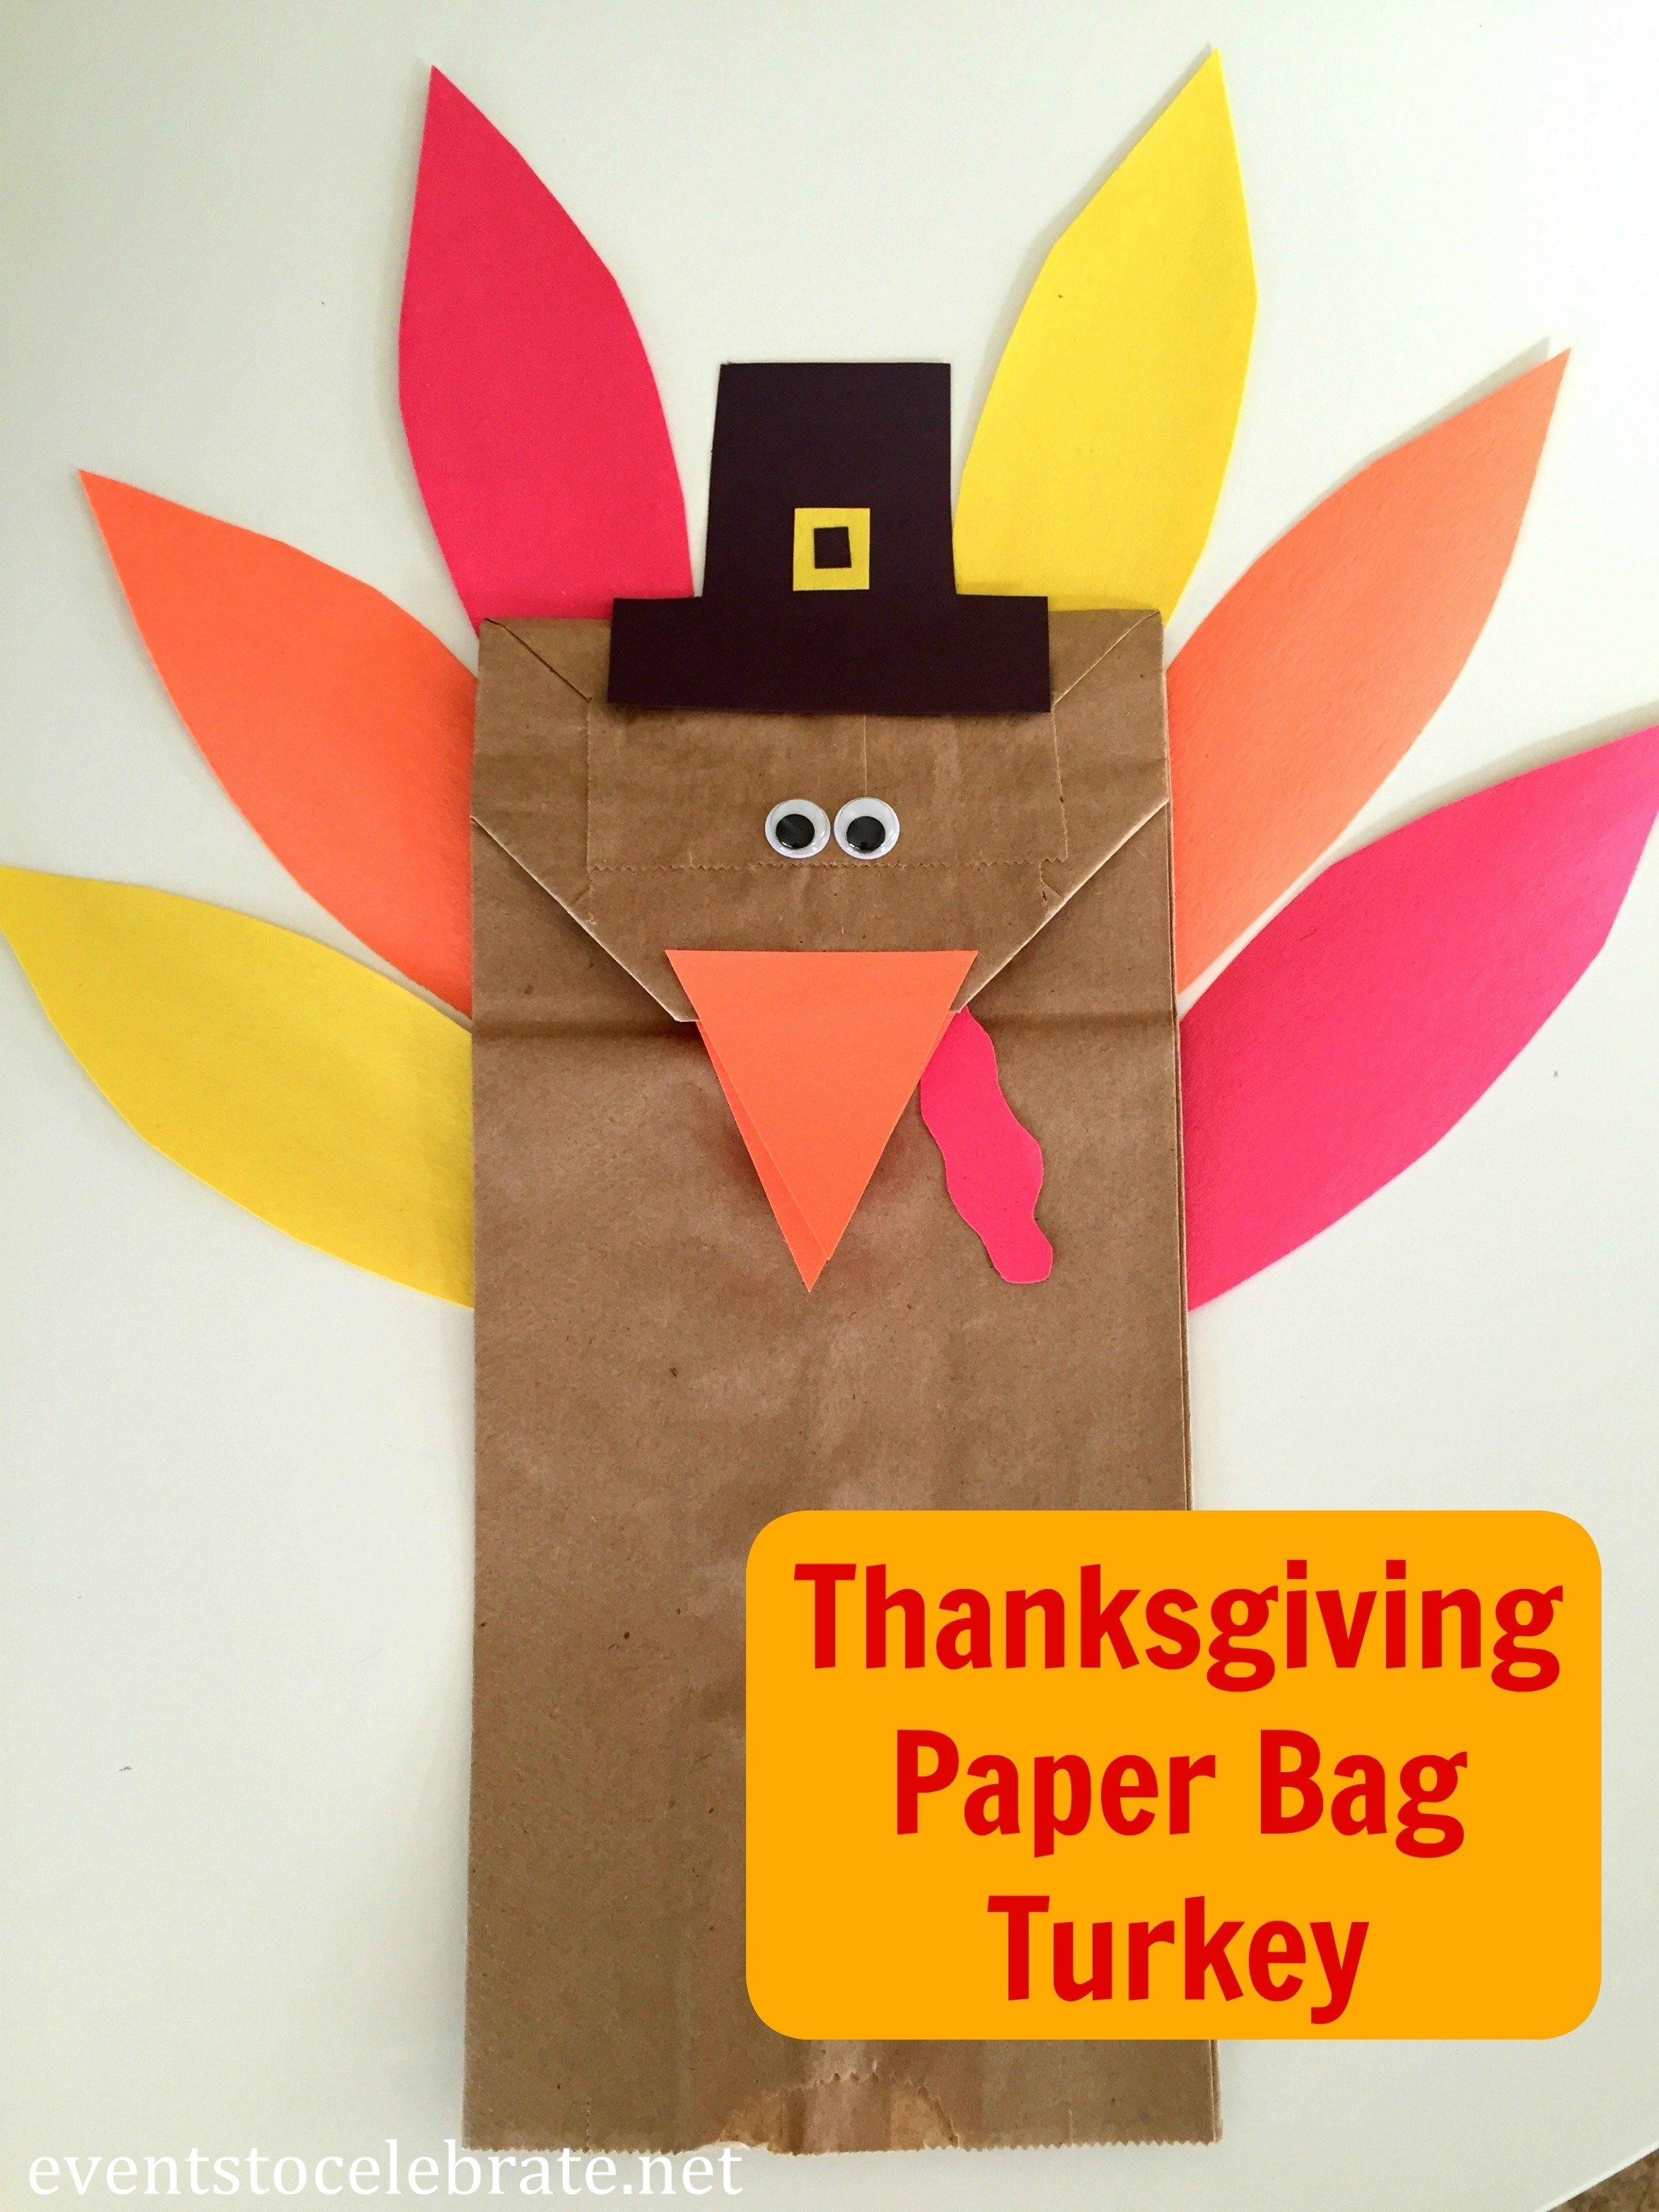 10 Best Thanksgiving Craft Ideas For Preschoolers thanksgiving turkey craft for preschool events to celebrate 2020